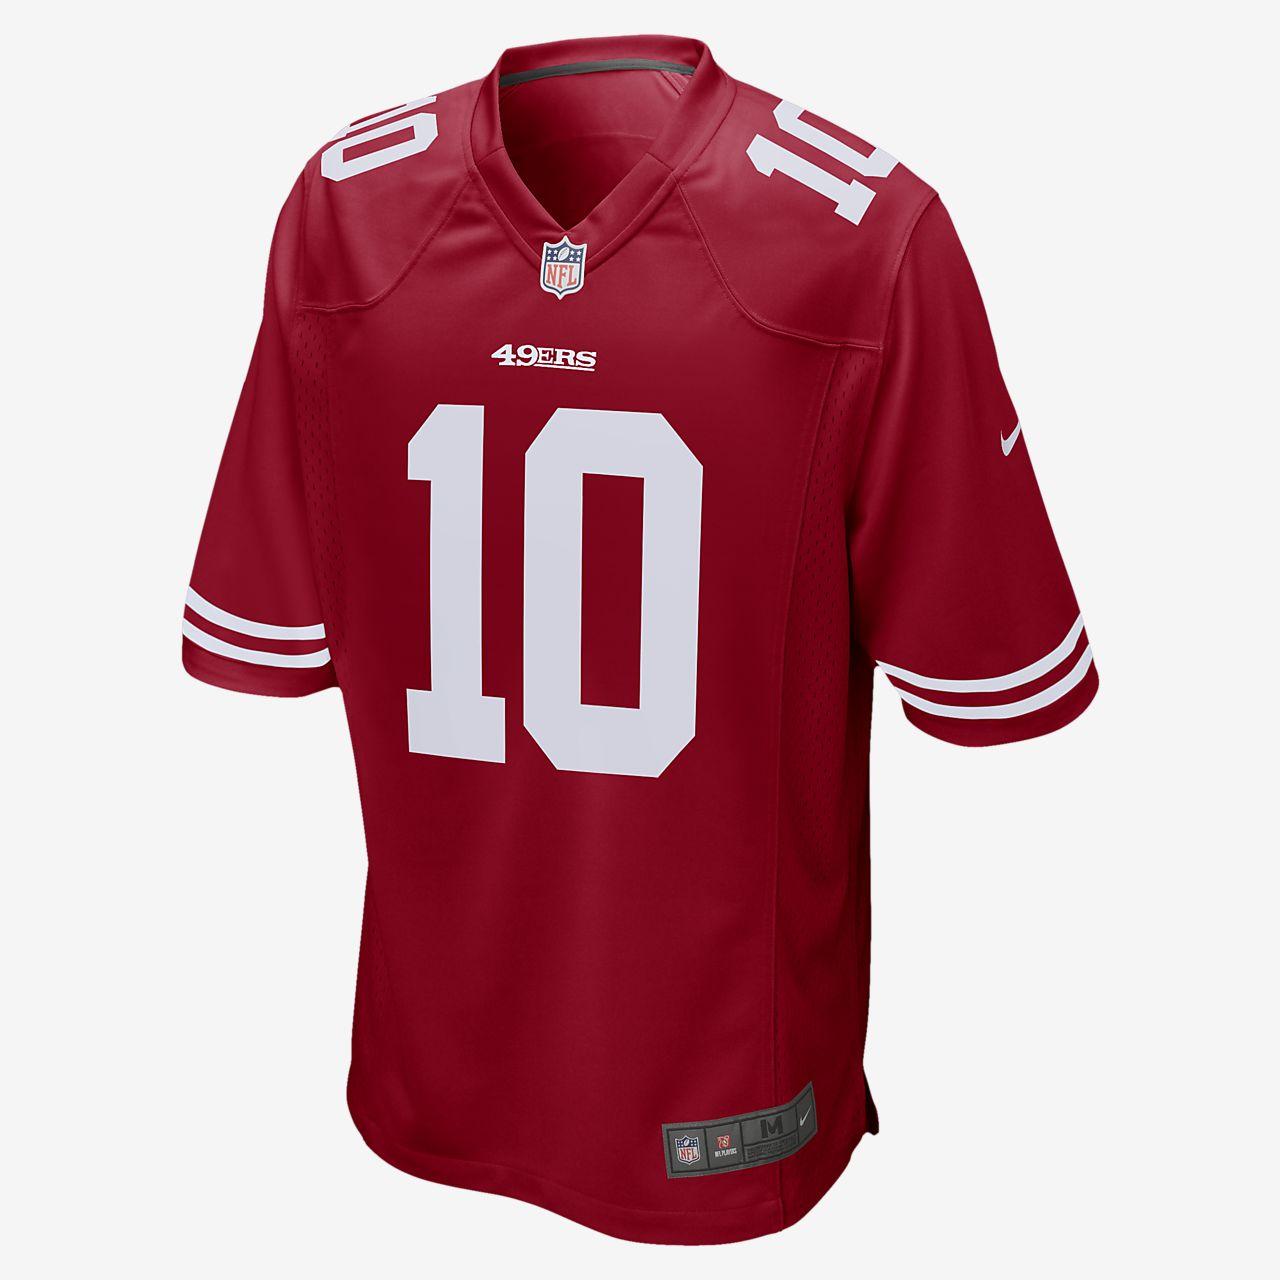 NFL San Francisco 49ers Game (Jimmy Garoppolo) Men s Football Jersey ... bcc80082a